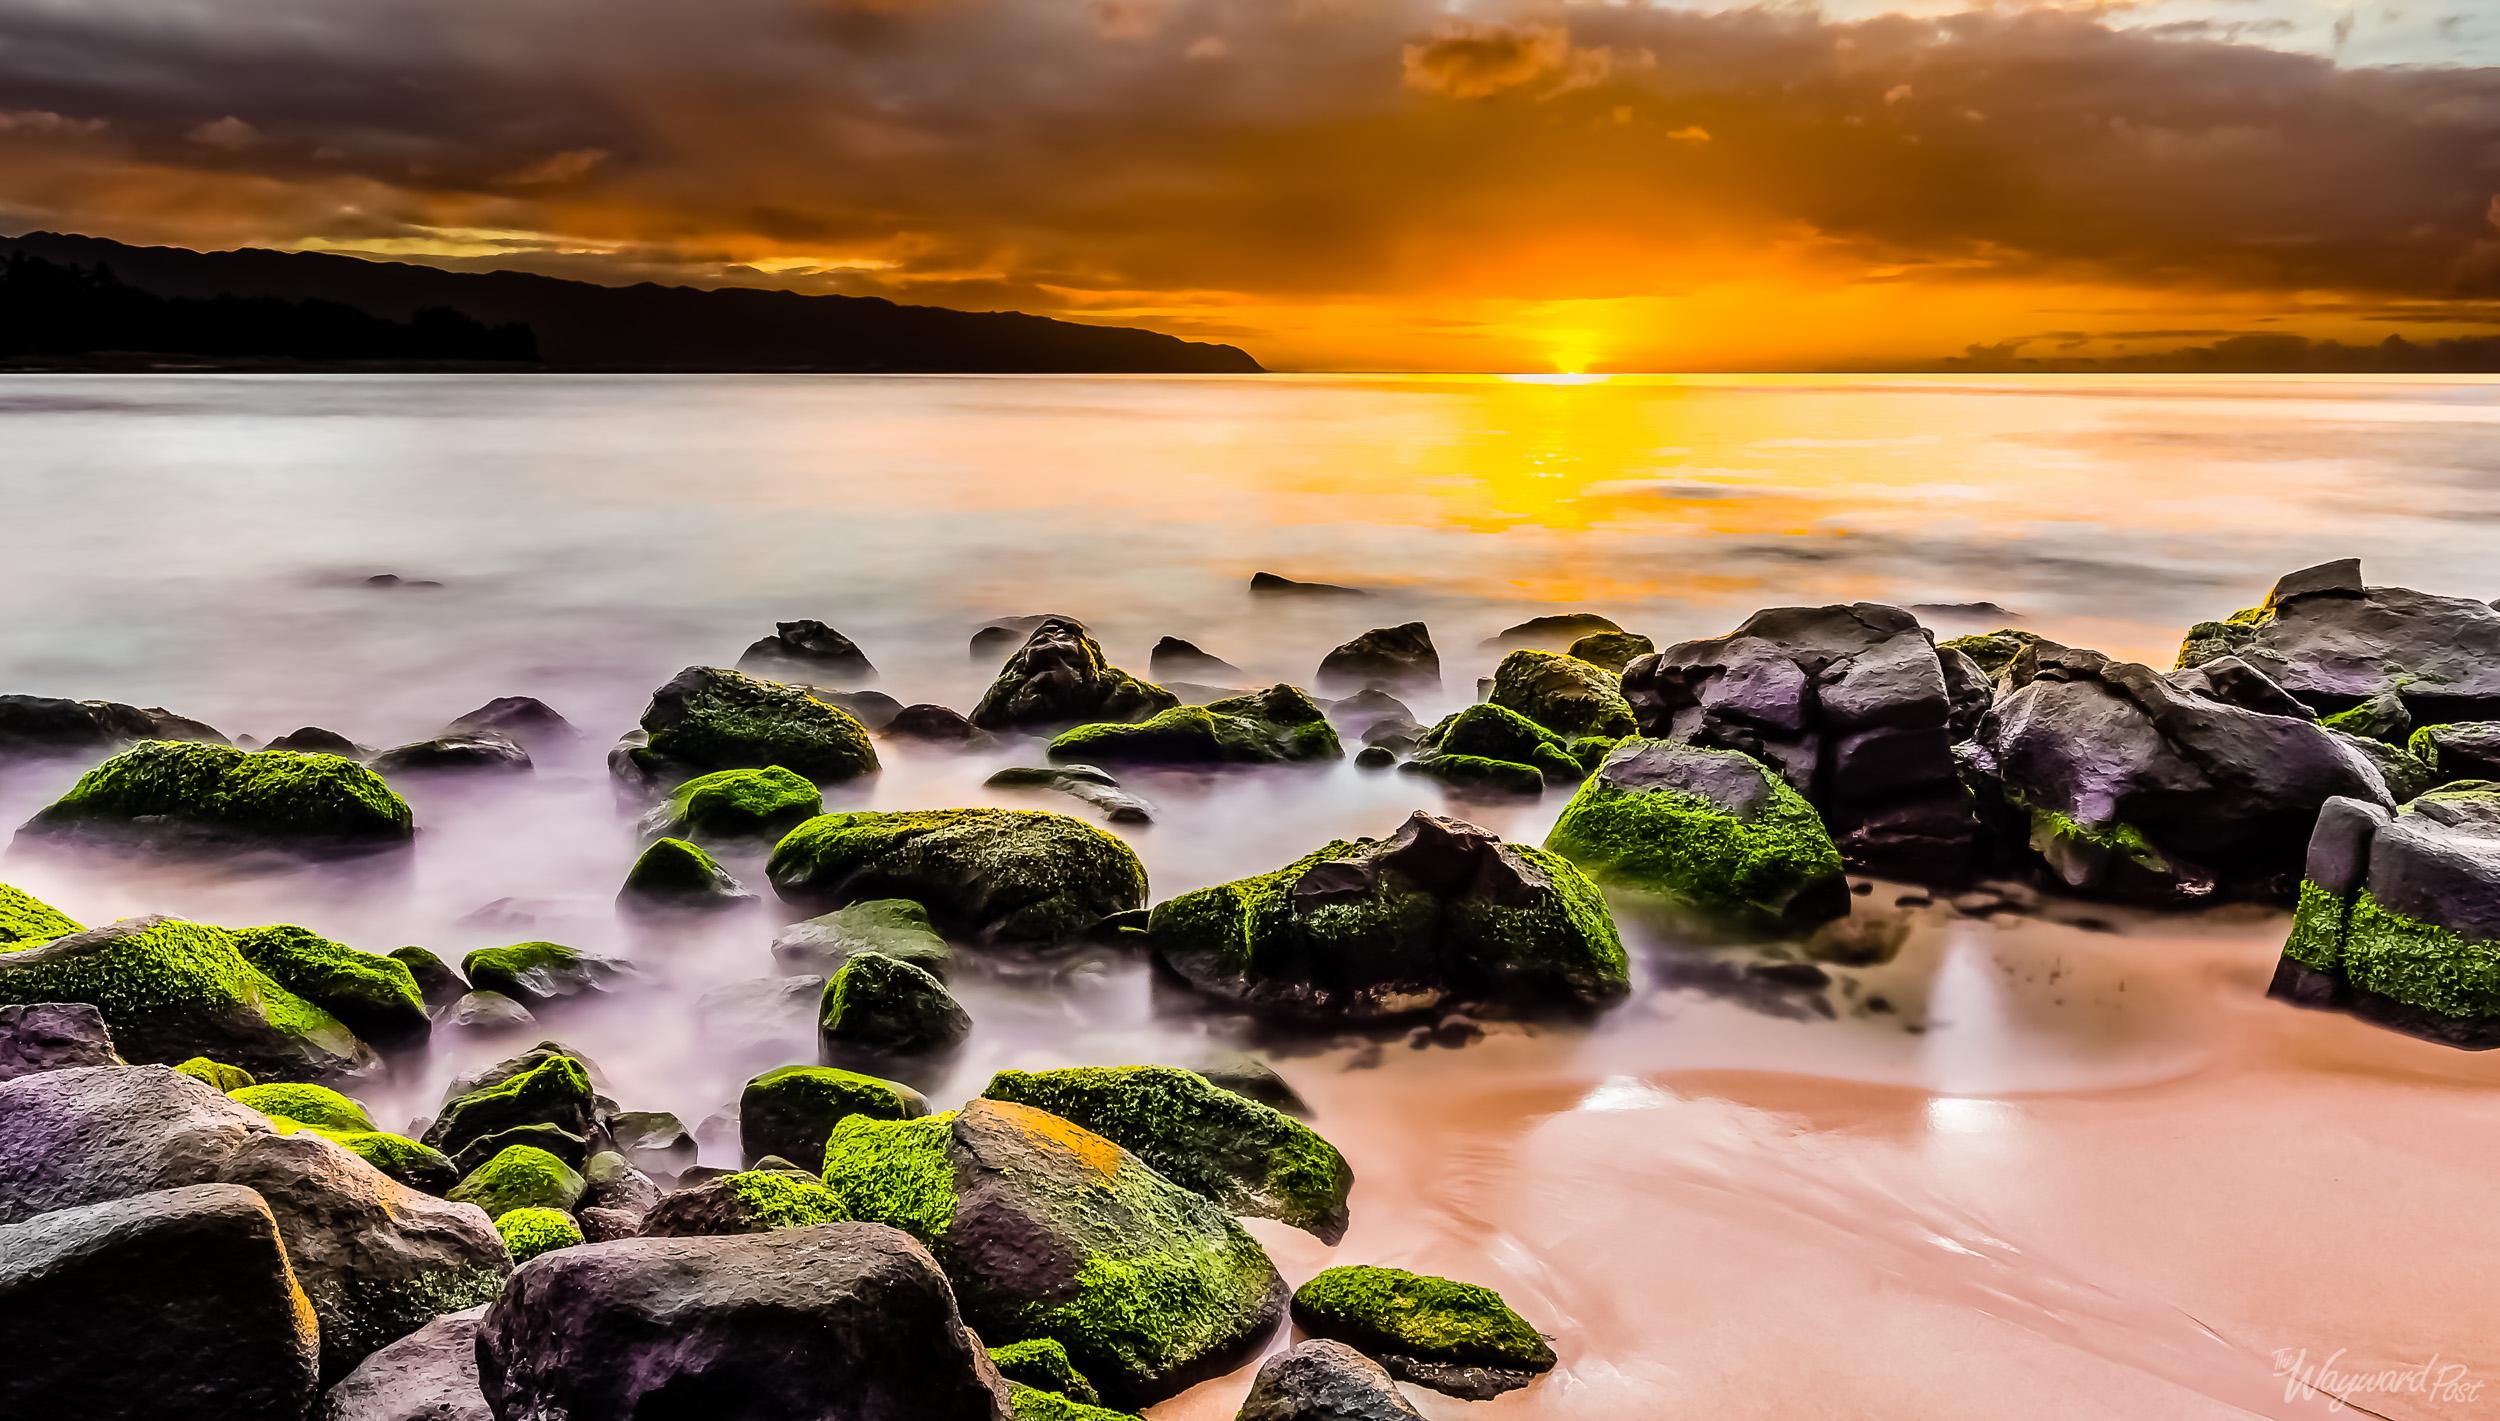 Sunset near Laniakea Beach on the North Shore of Oahu.